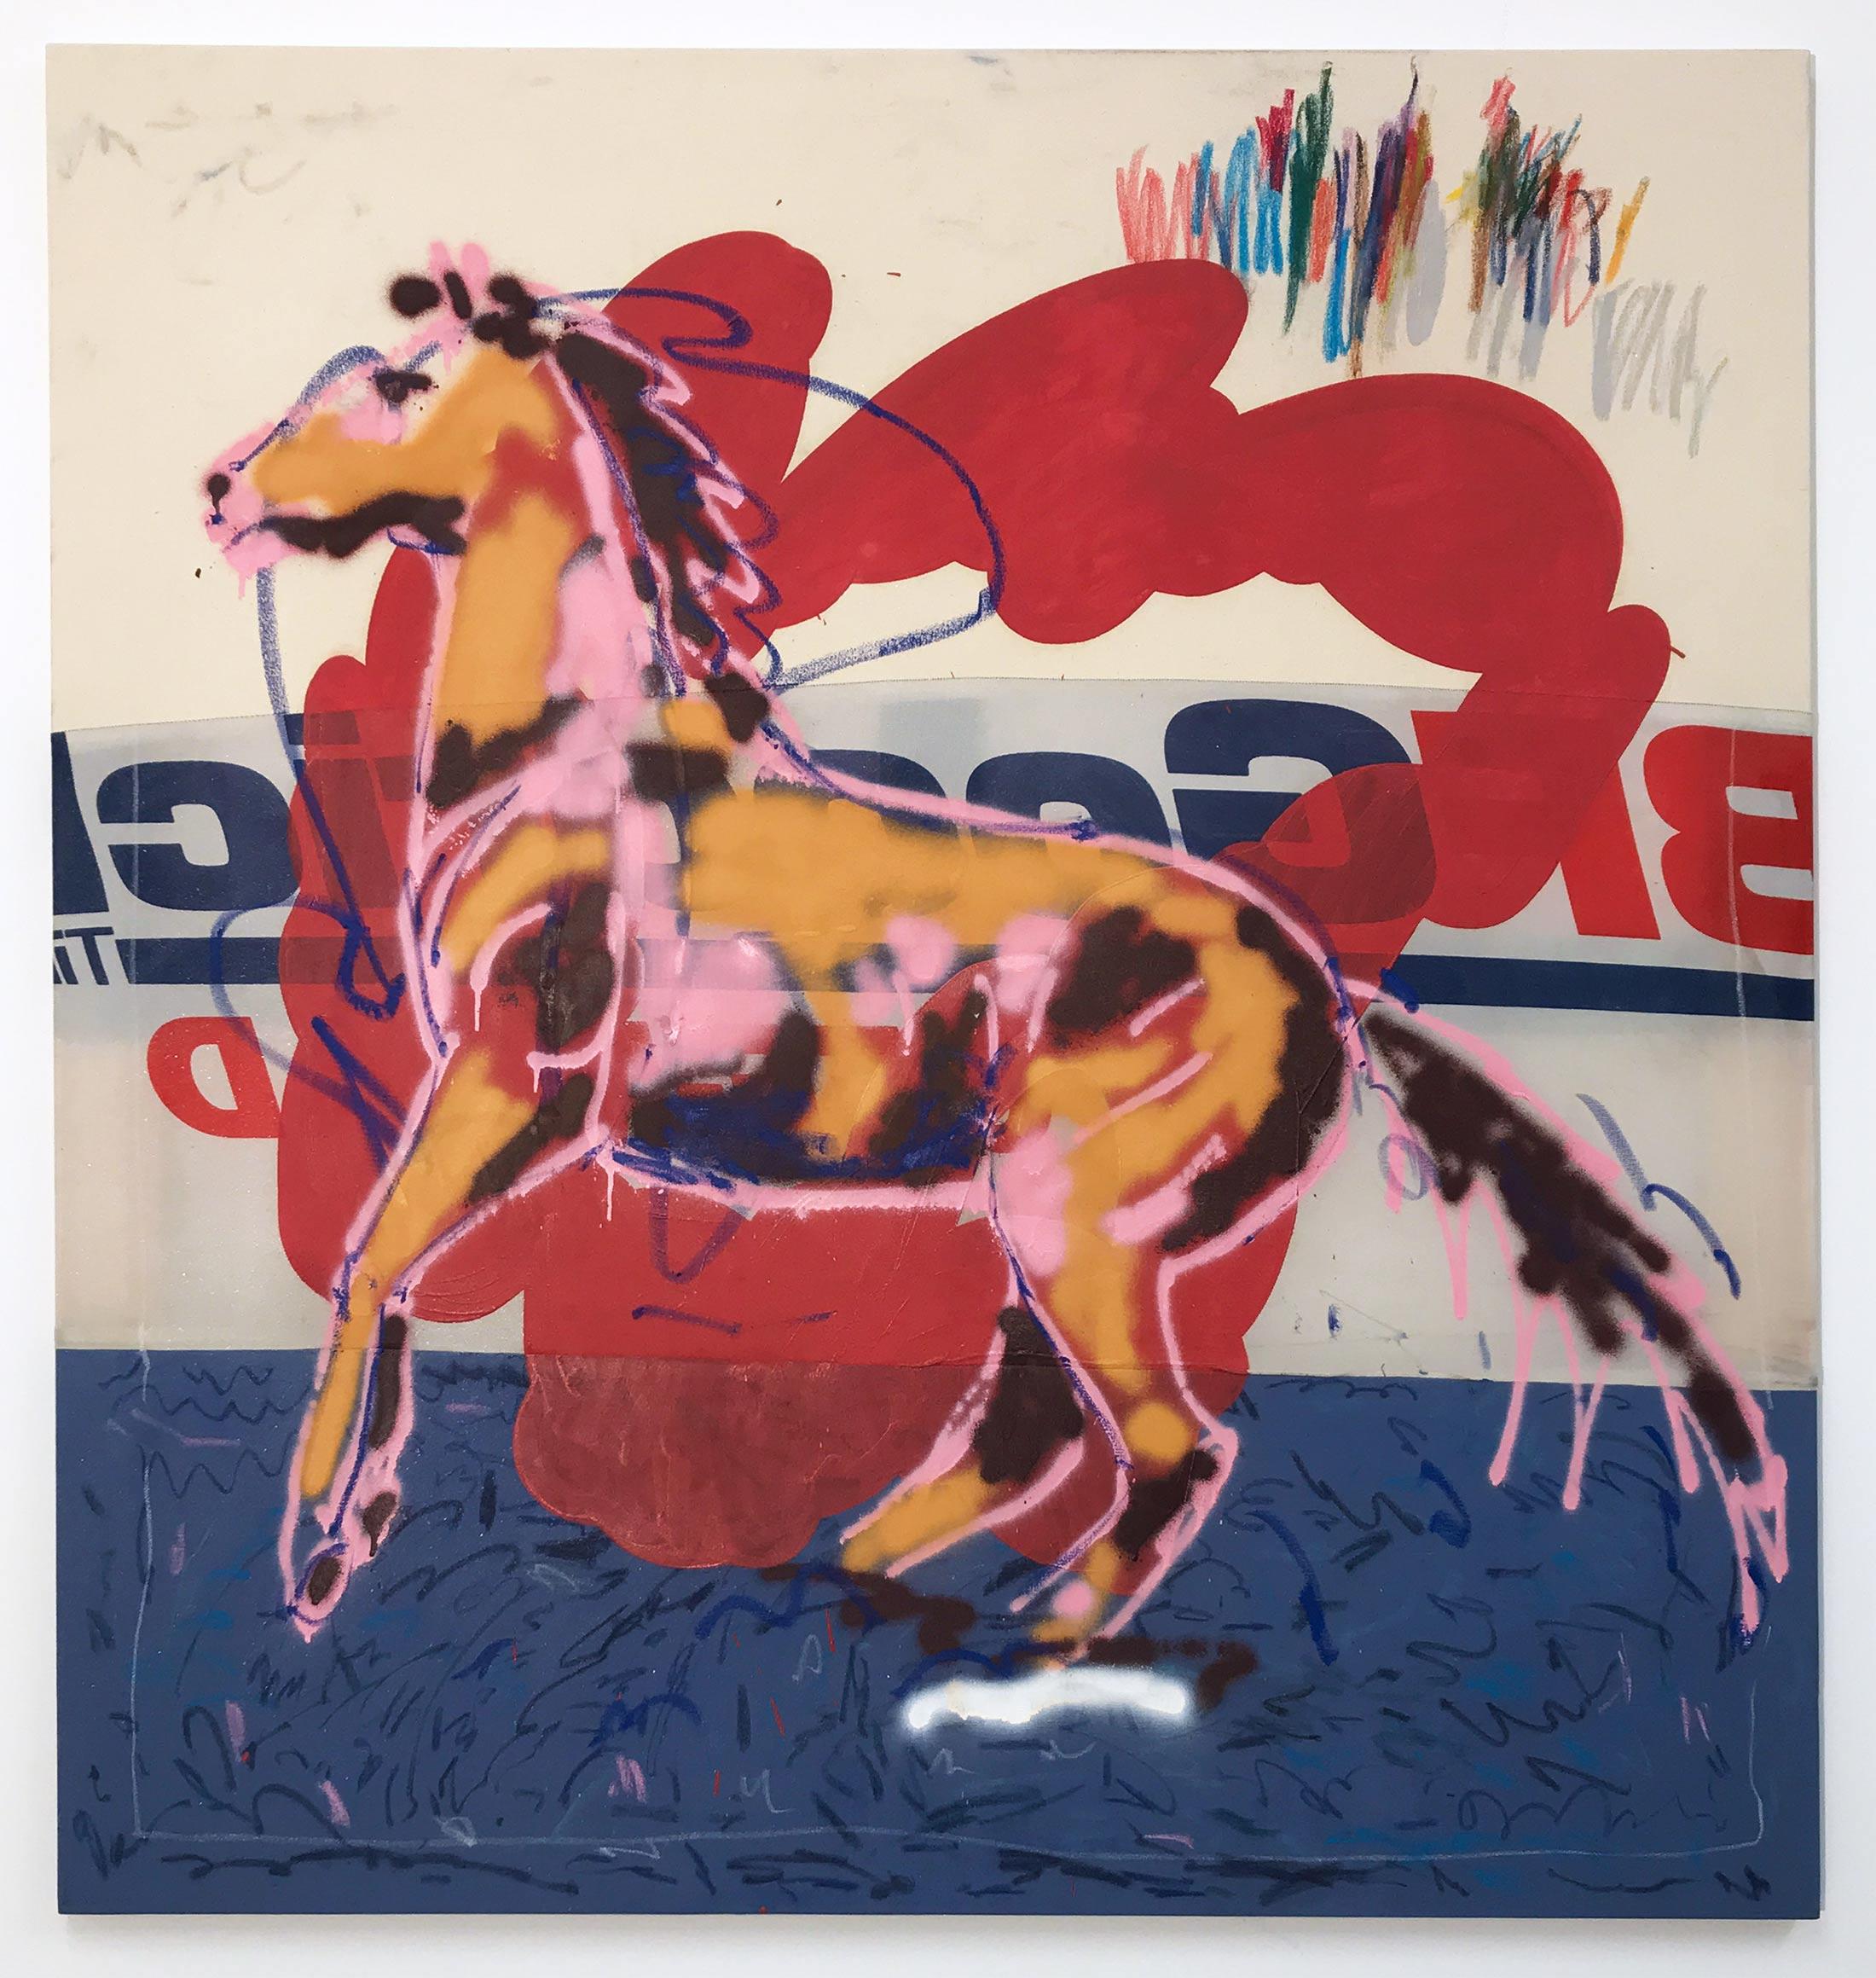 laurentius sauer, mixed media, spray paint, painting, coal, spotlight on, featured artist, contemporary art, world